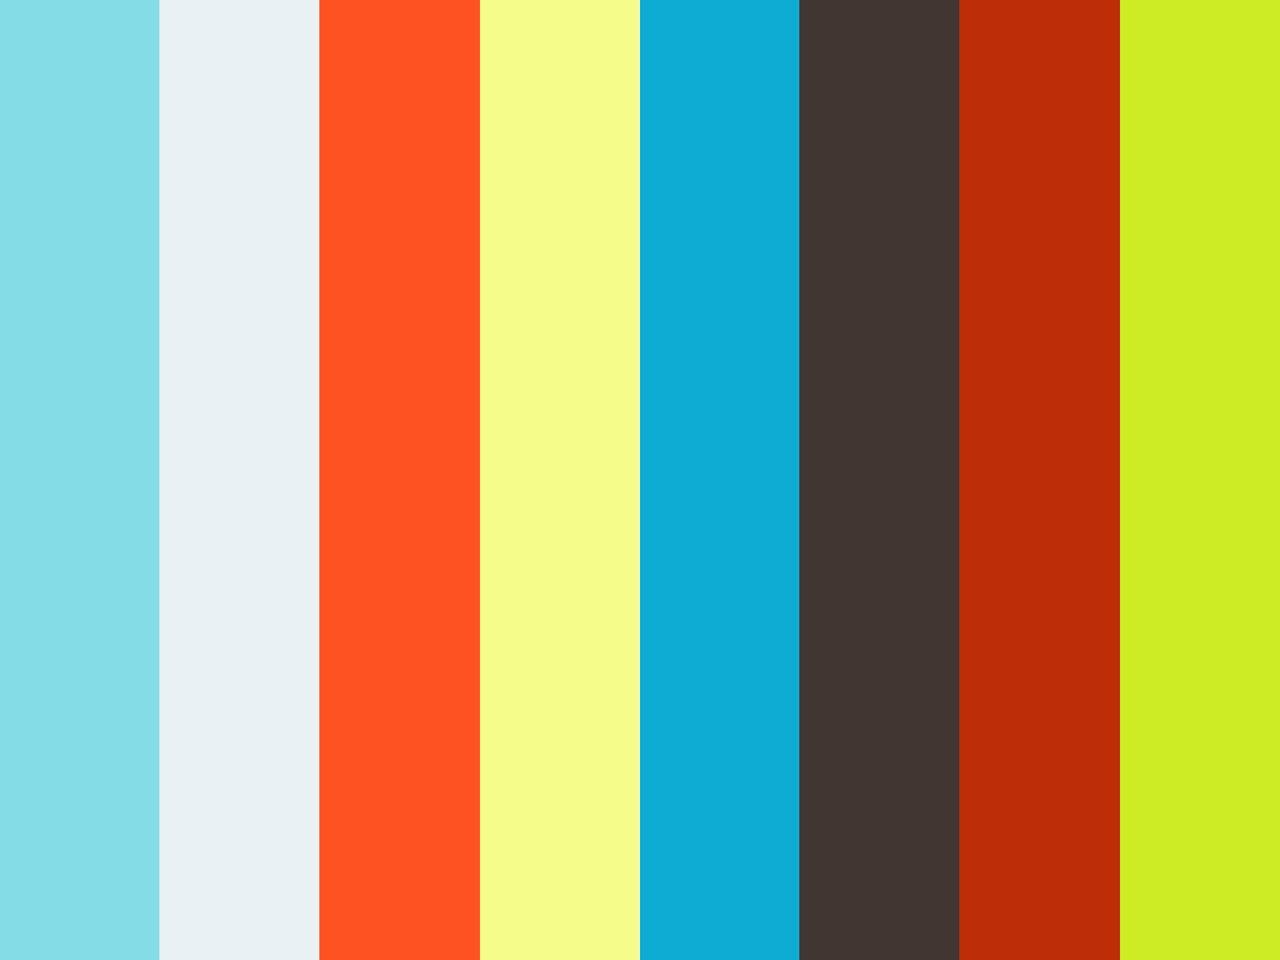 Webstock '10: Scott Thomas - Web design that grabs people